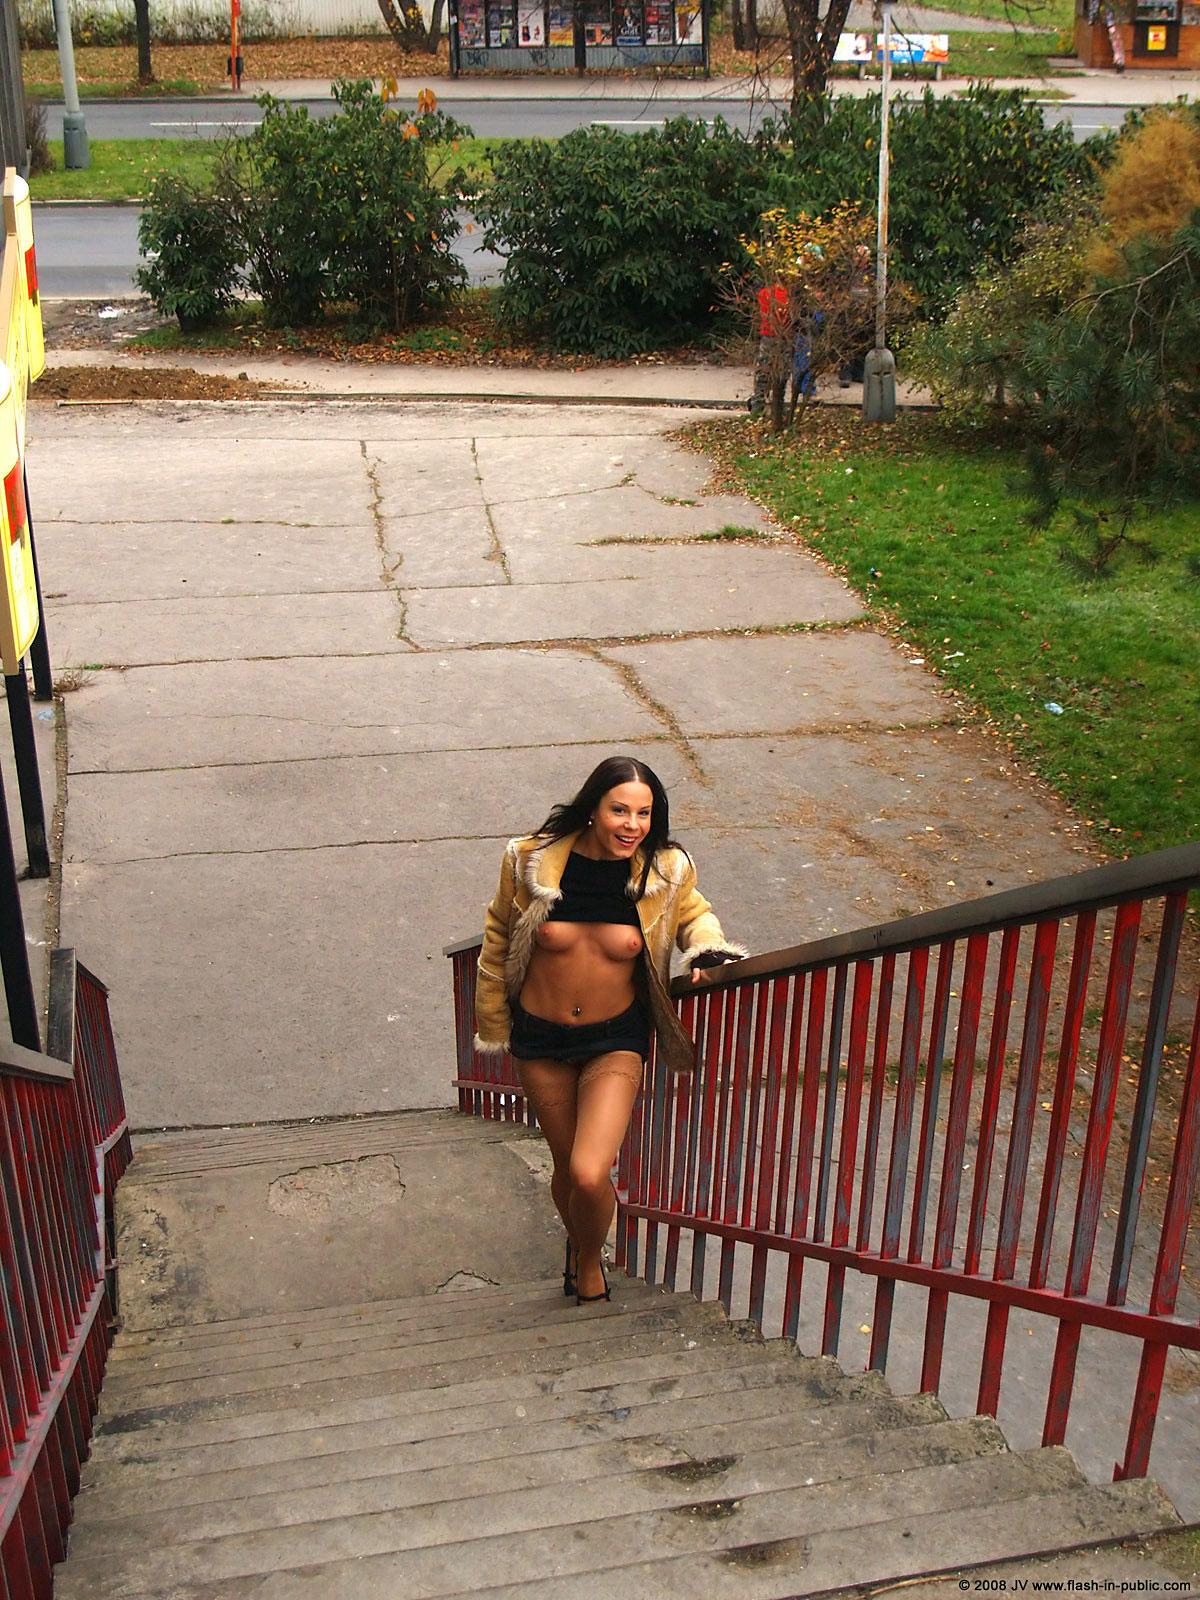 alexandra-g-bottomless-stockings-flash-in-public-17